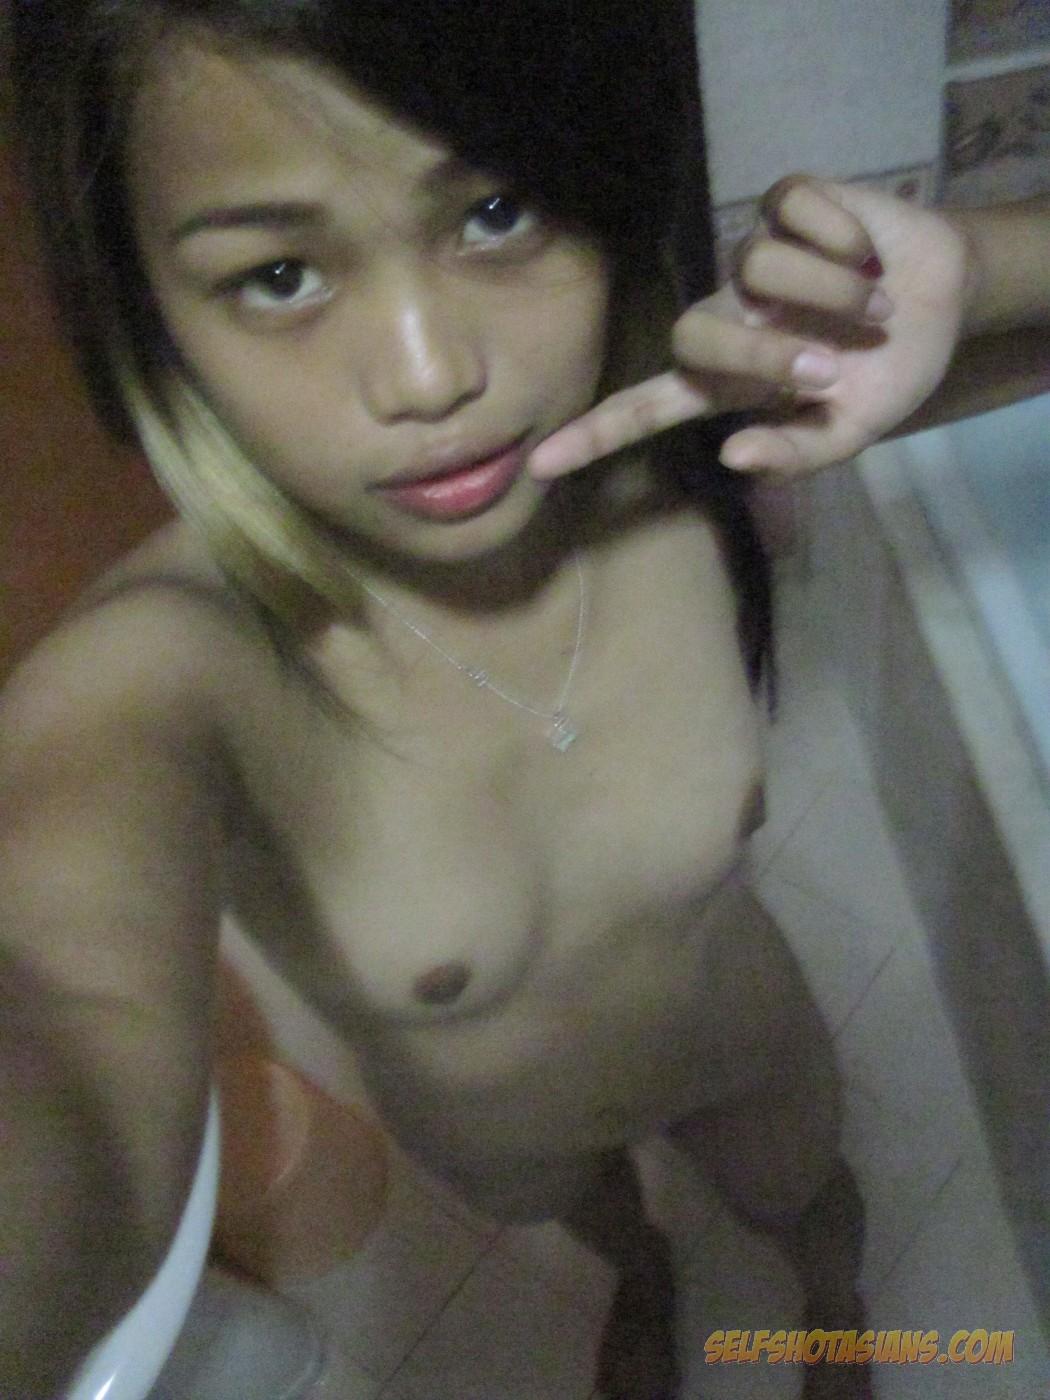 Very young teen girls nude self shots